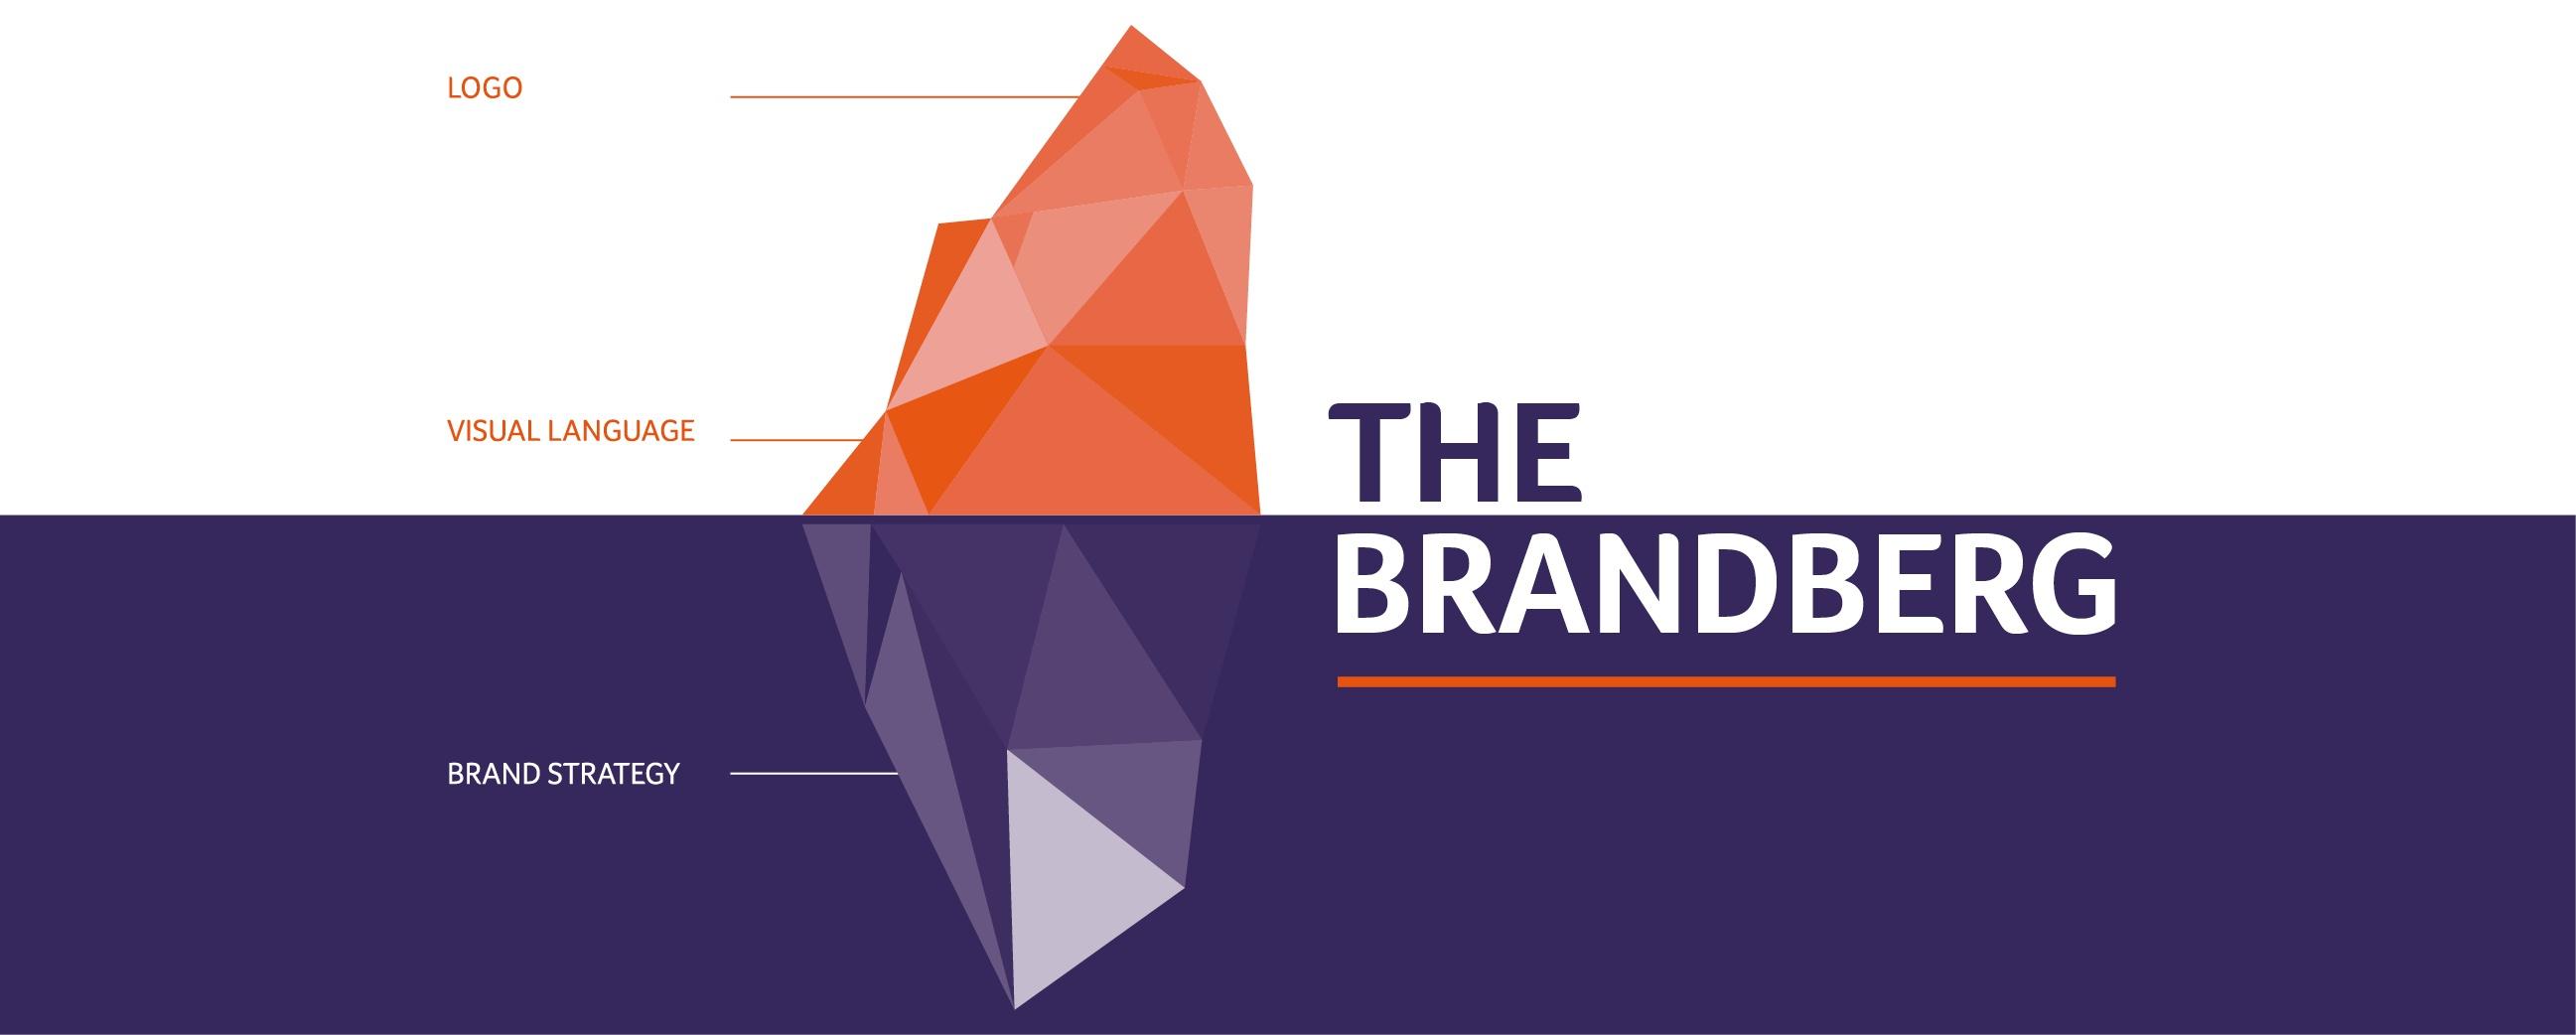 The Brandberg